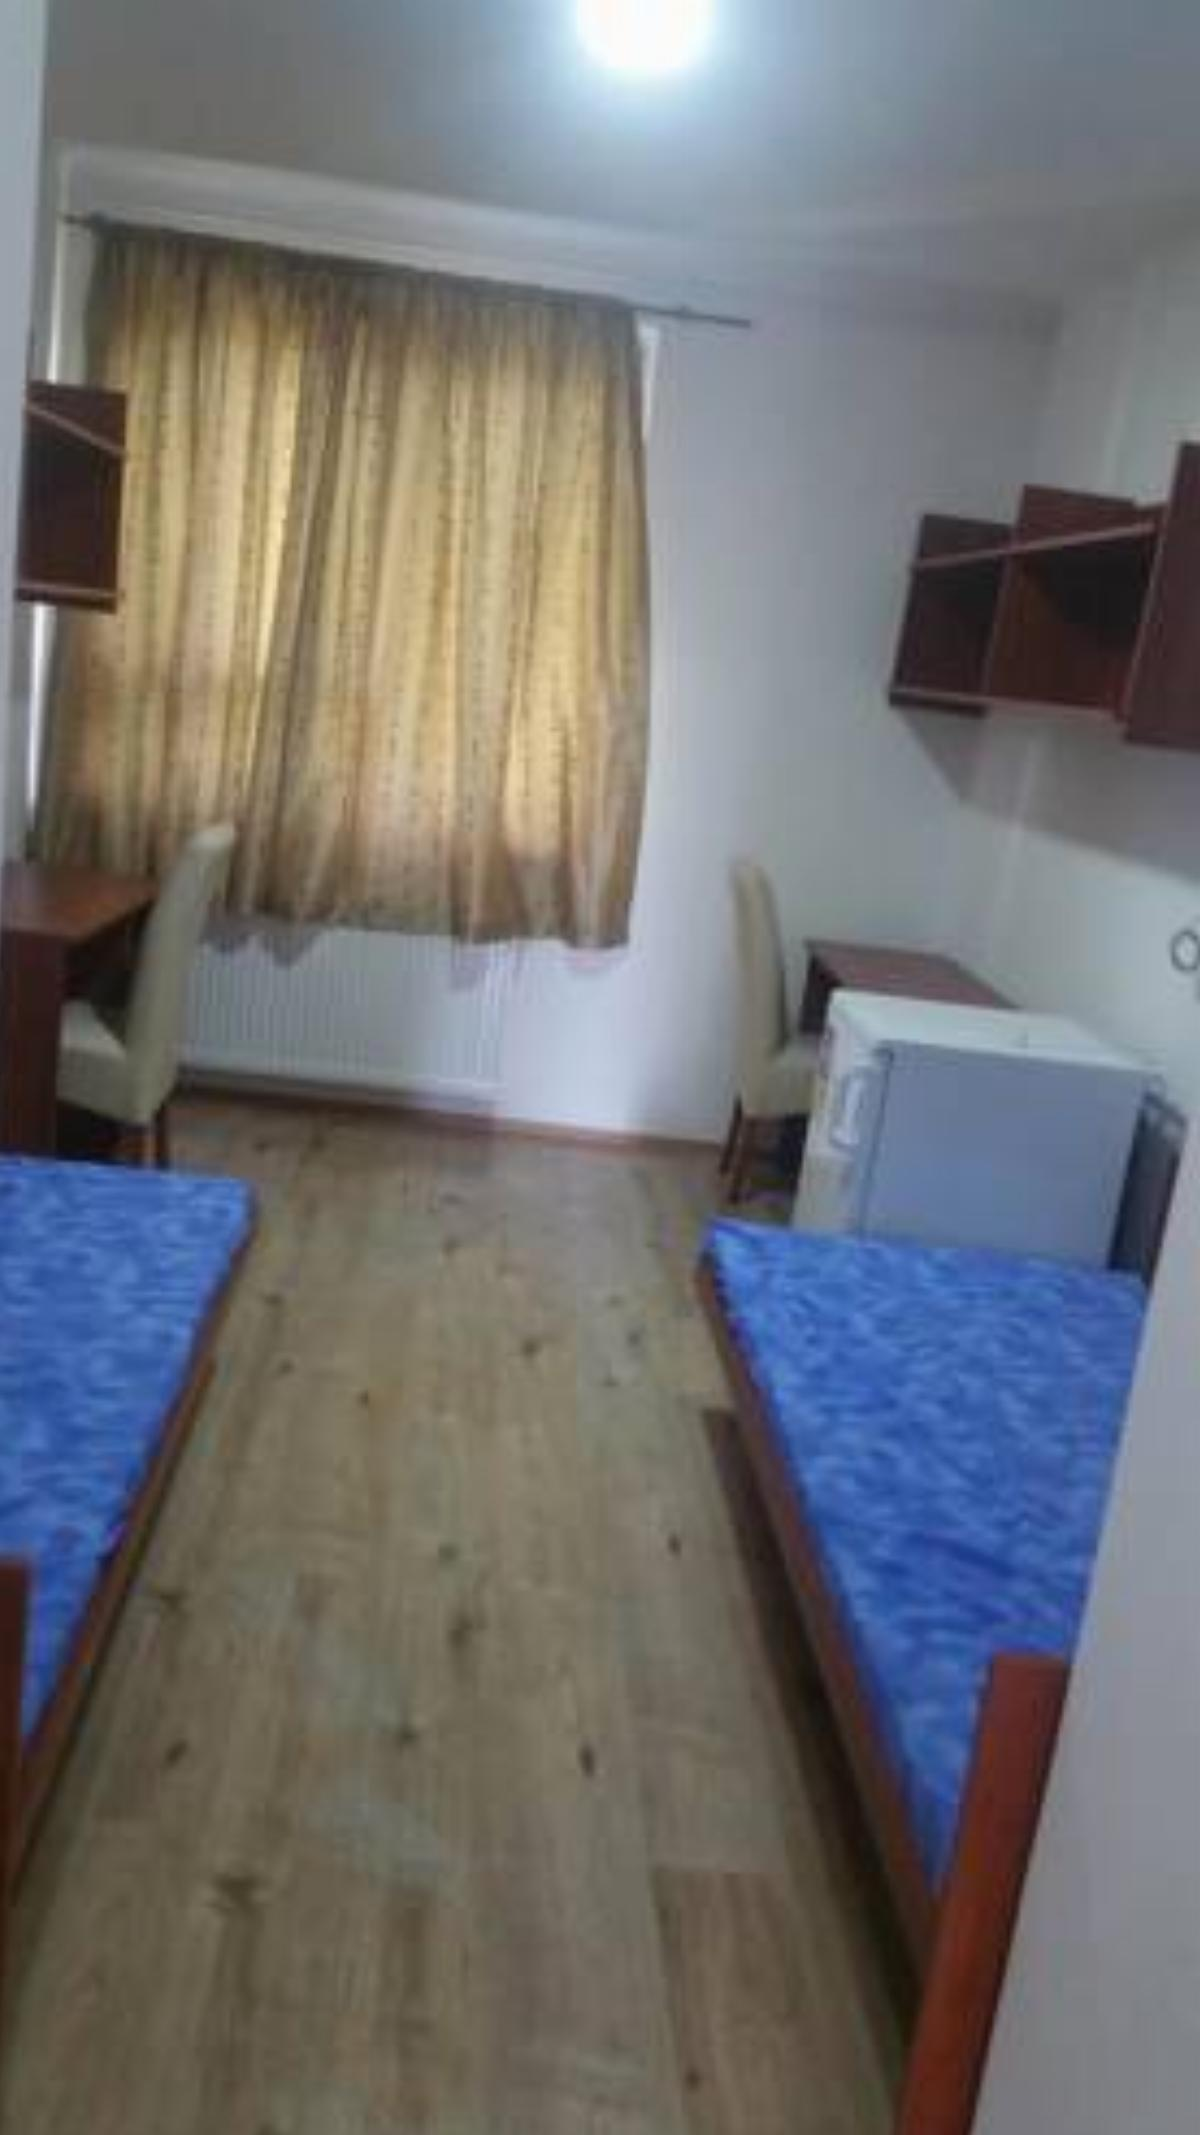 budai di ksz ll hotel budapest hungary overview rh hotel board com